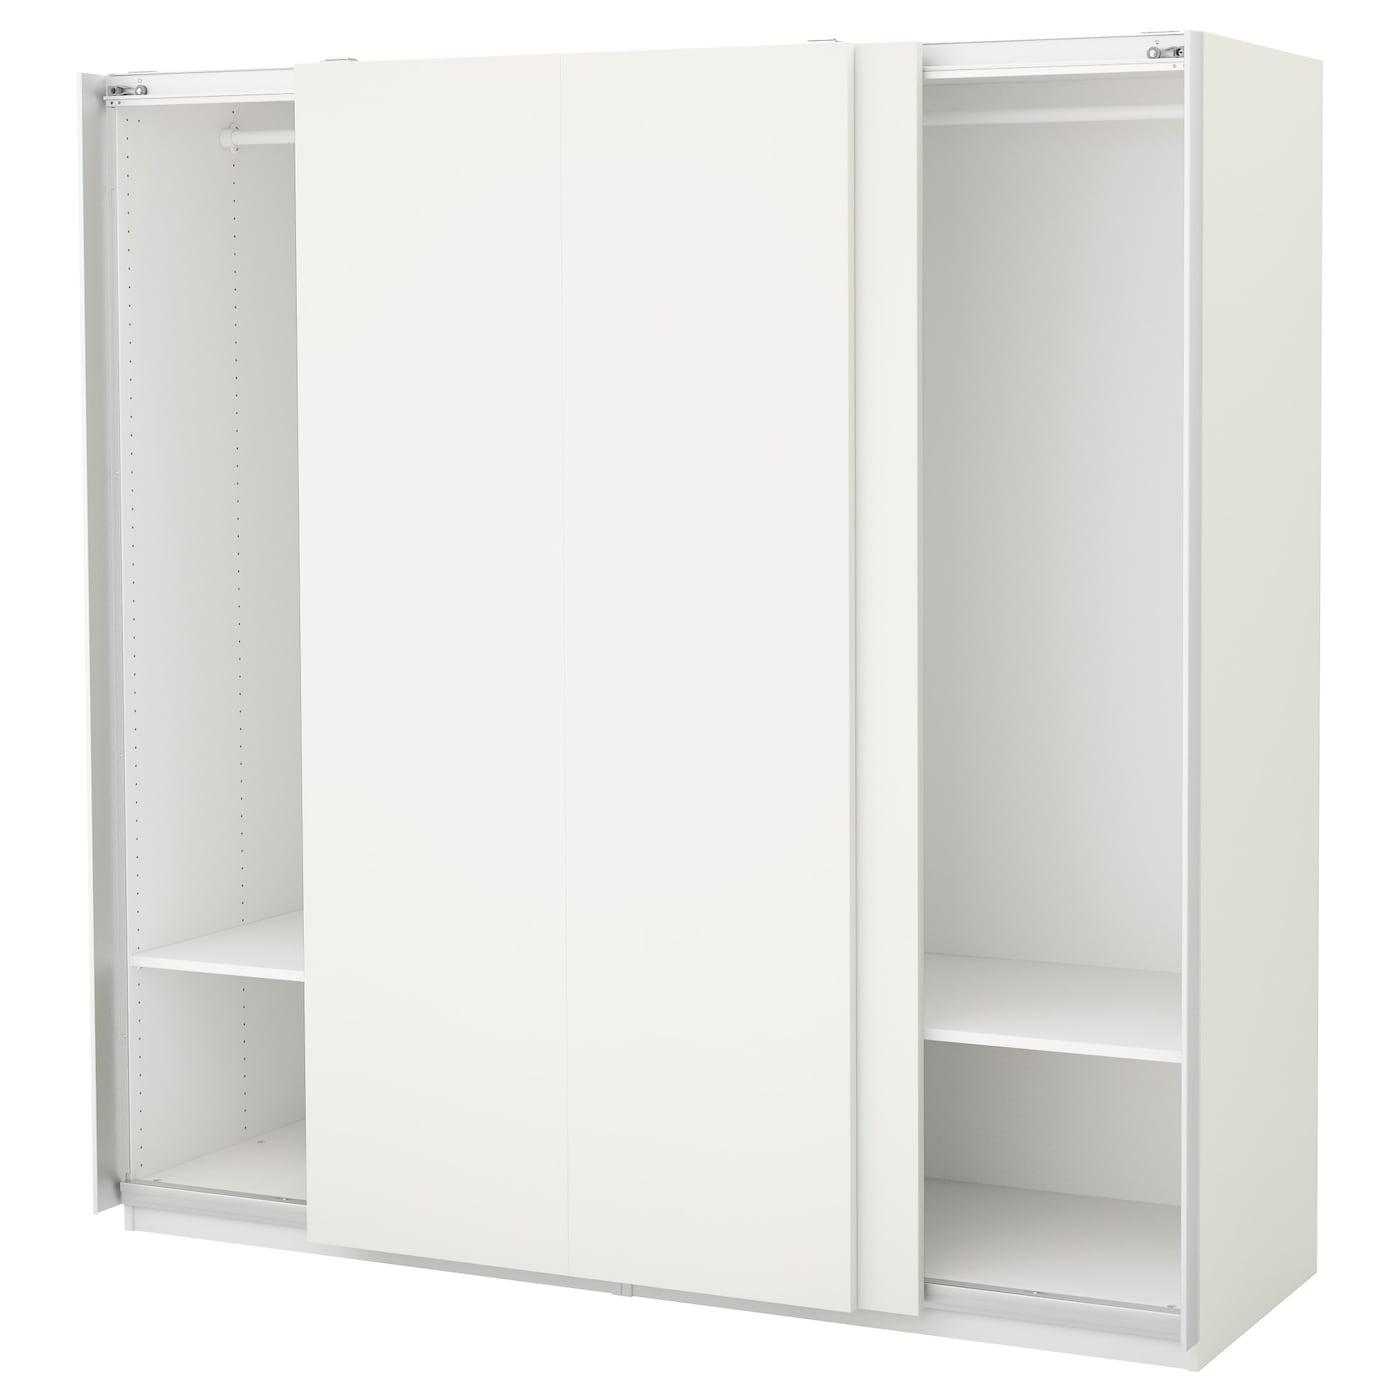 pax armoire penderie blanc hasvik blanc 200 x 66 x 201 cm ikea. Black Bedroom Furniture Sets. Home Design Ideas